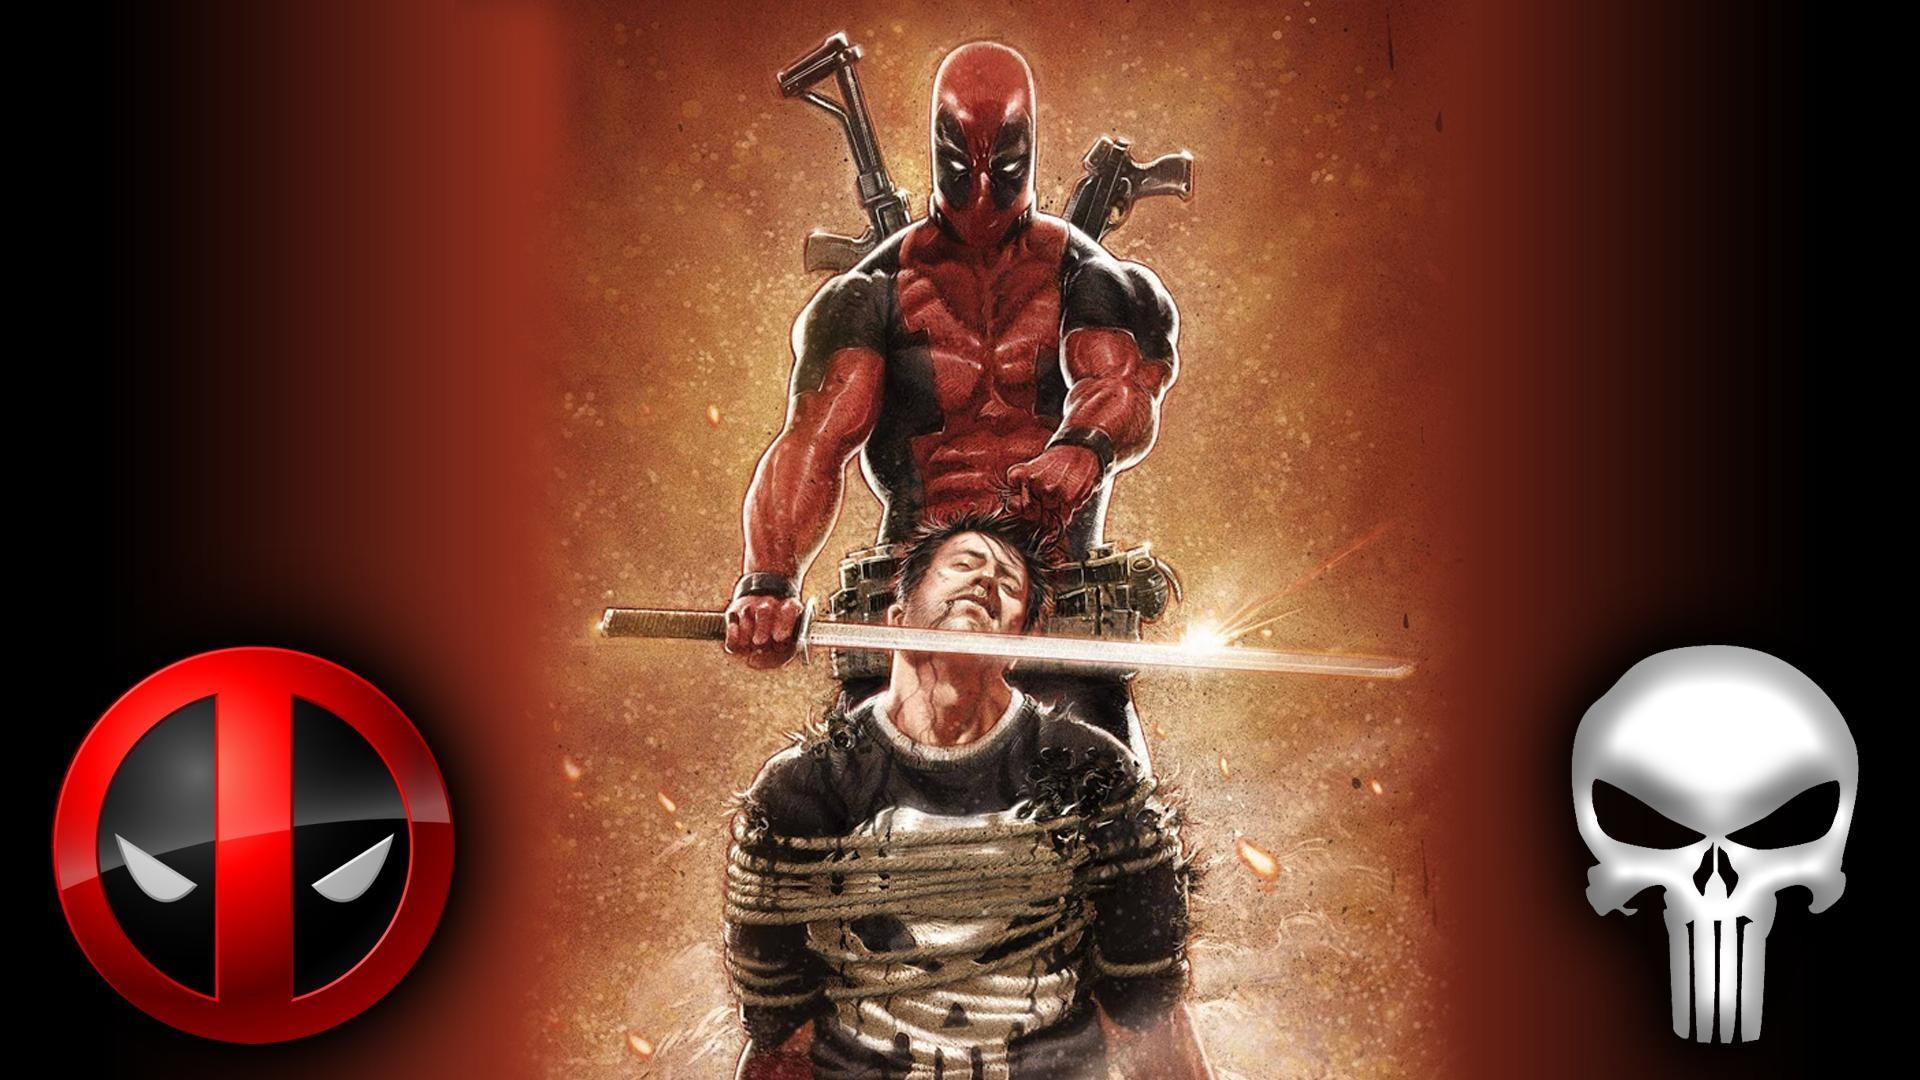 Deadpool Punisher wallpaper by Badonk on DeviantArt